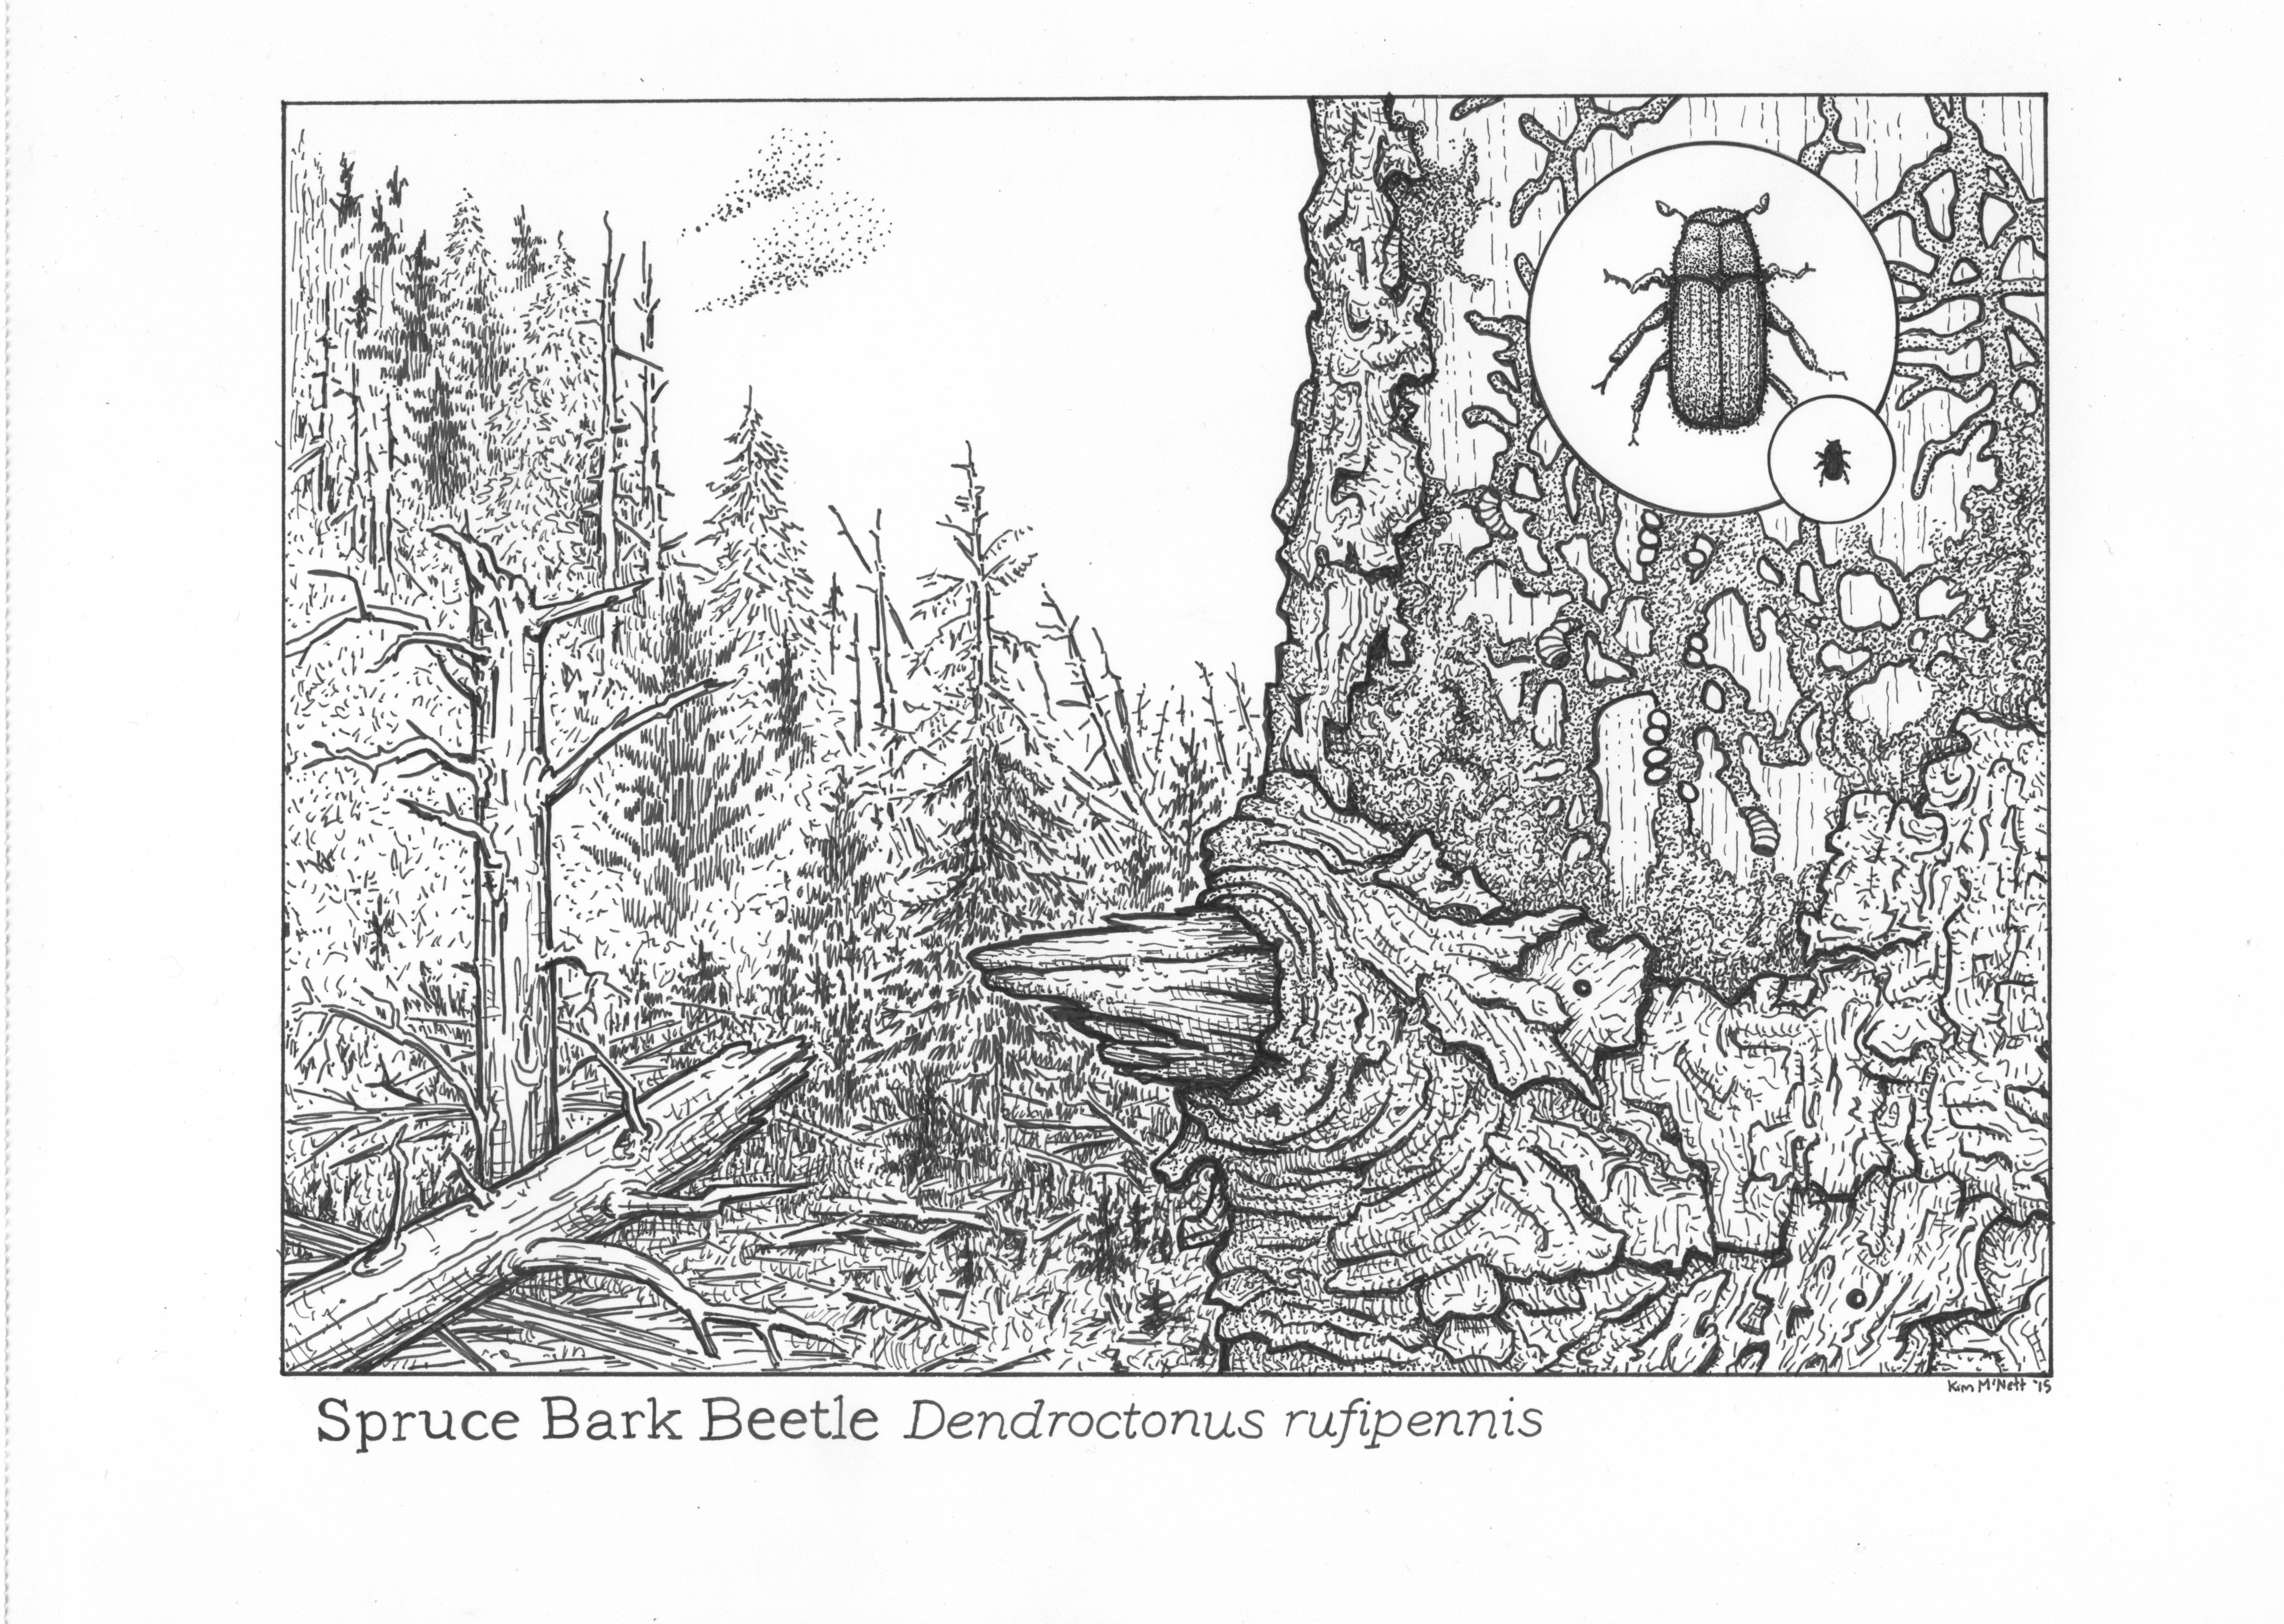 Spruce Bark Beetle, Dendroctonus rufipennis drawing, spruce bark beetle drawing, bark beetle illustration, bark beetle, climate change, Kenai, Alaska, beetle outbreak